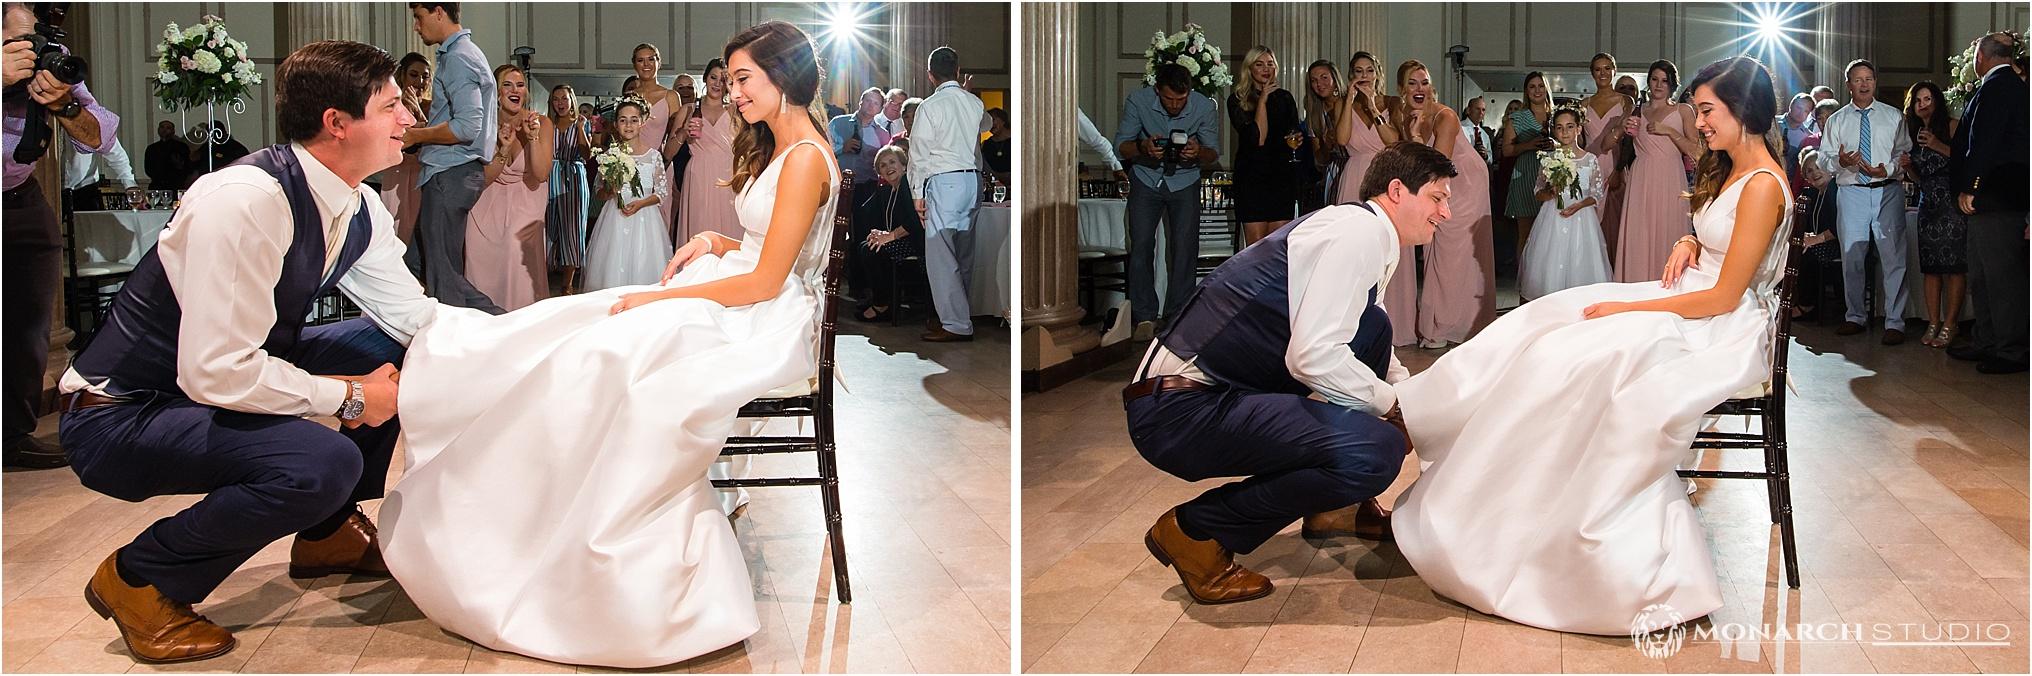 st-augustine-wedding-photographer-139.jpg